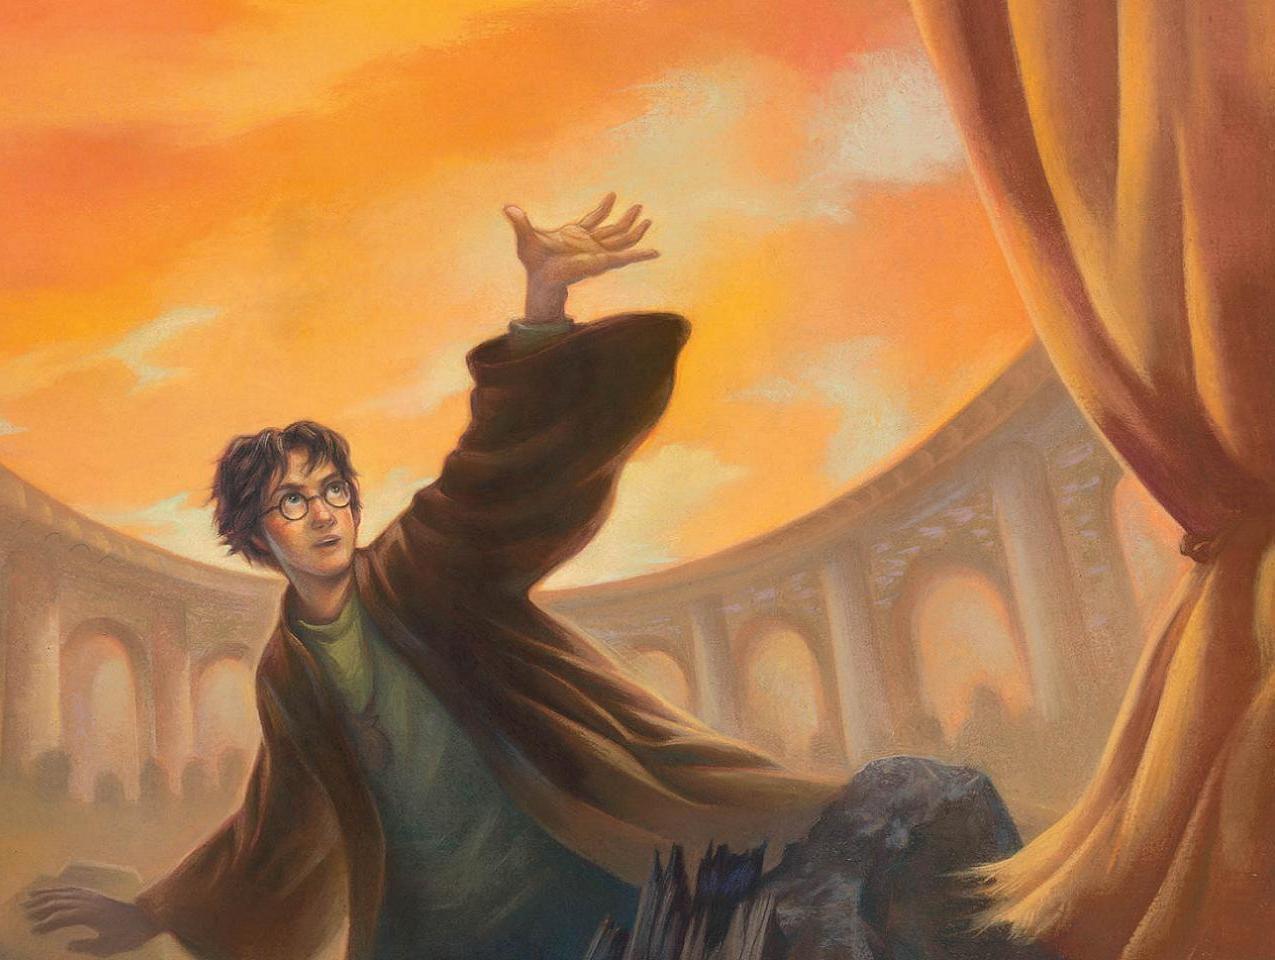 Harry potter wallpaper hd download - Harry potter images download ...